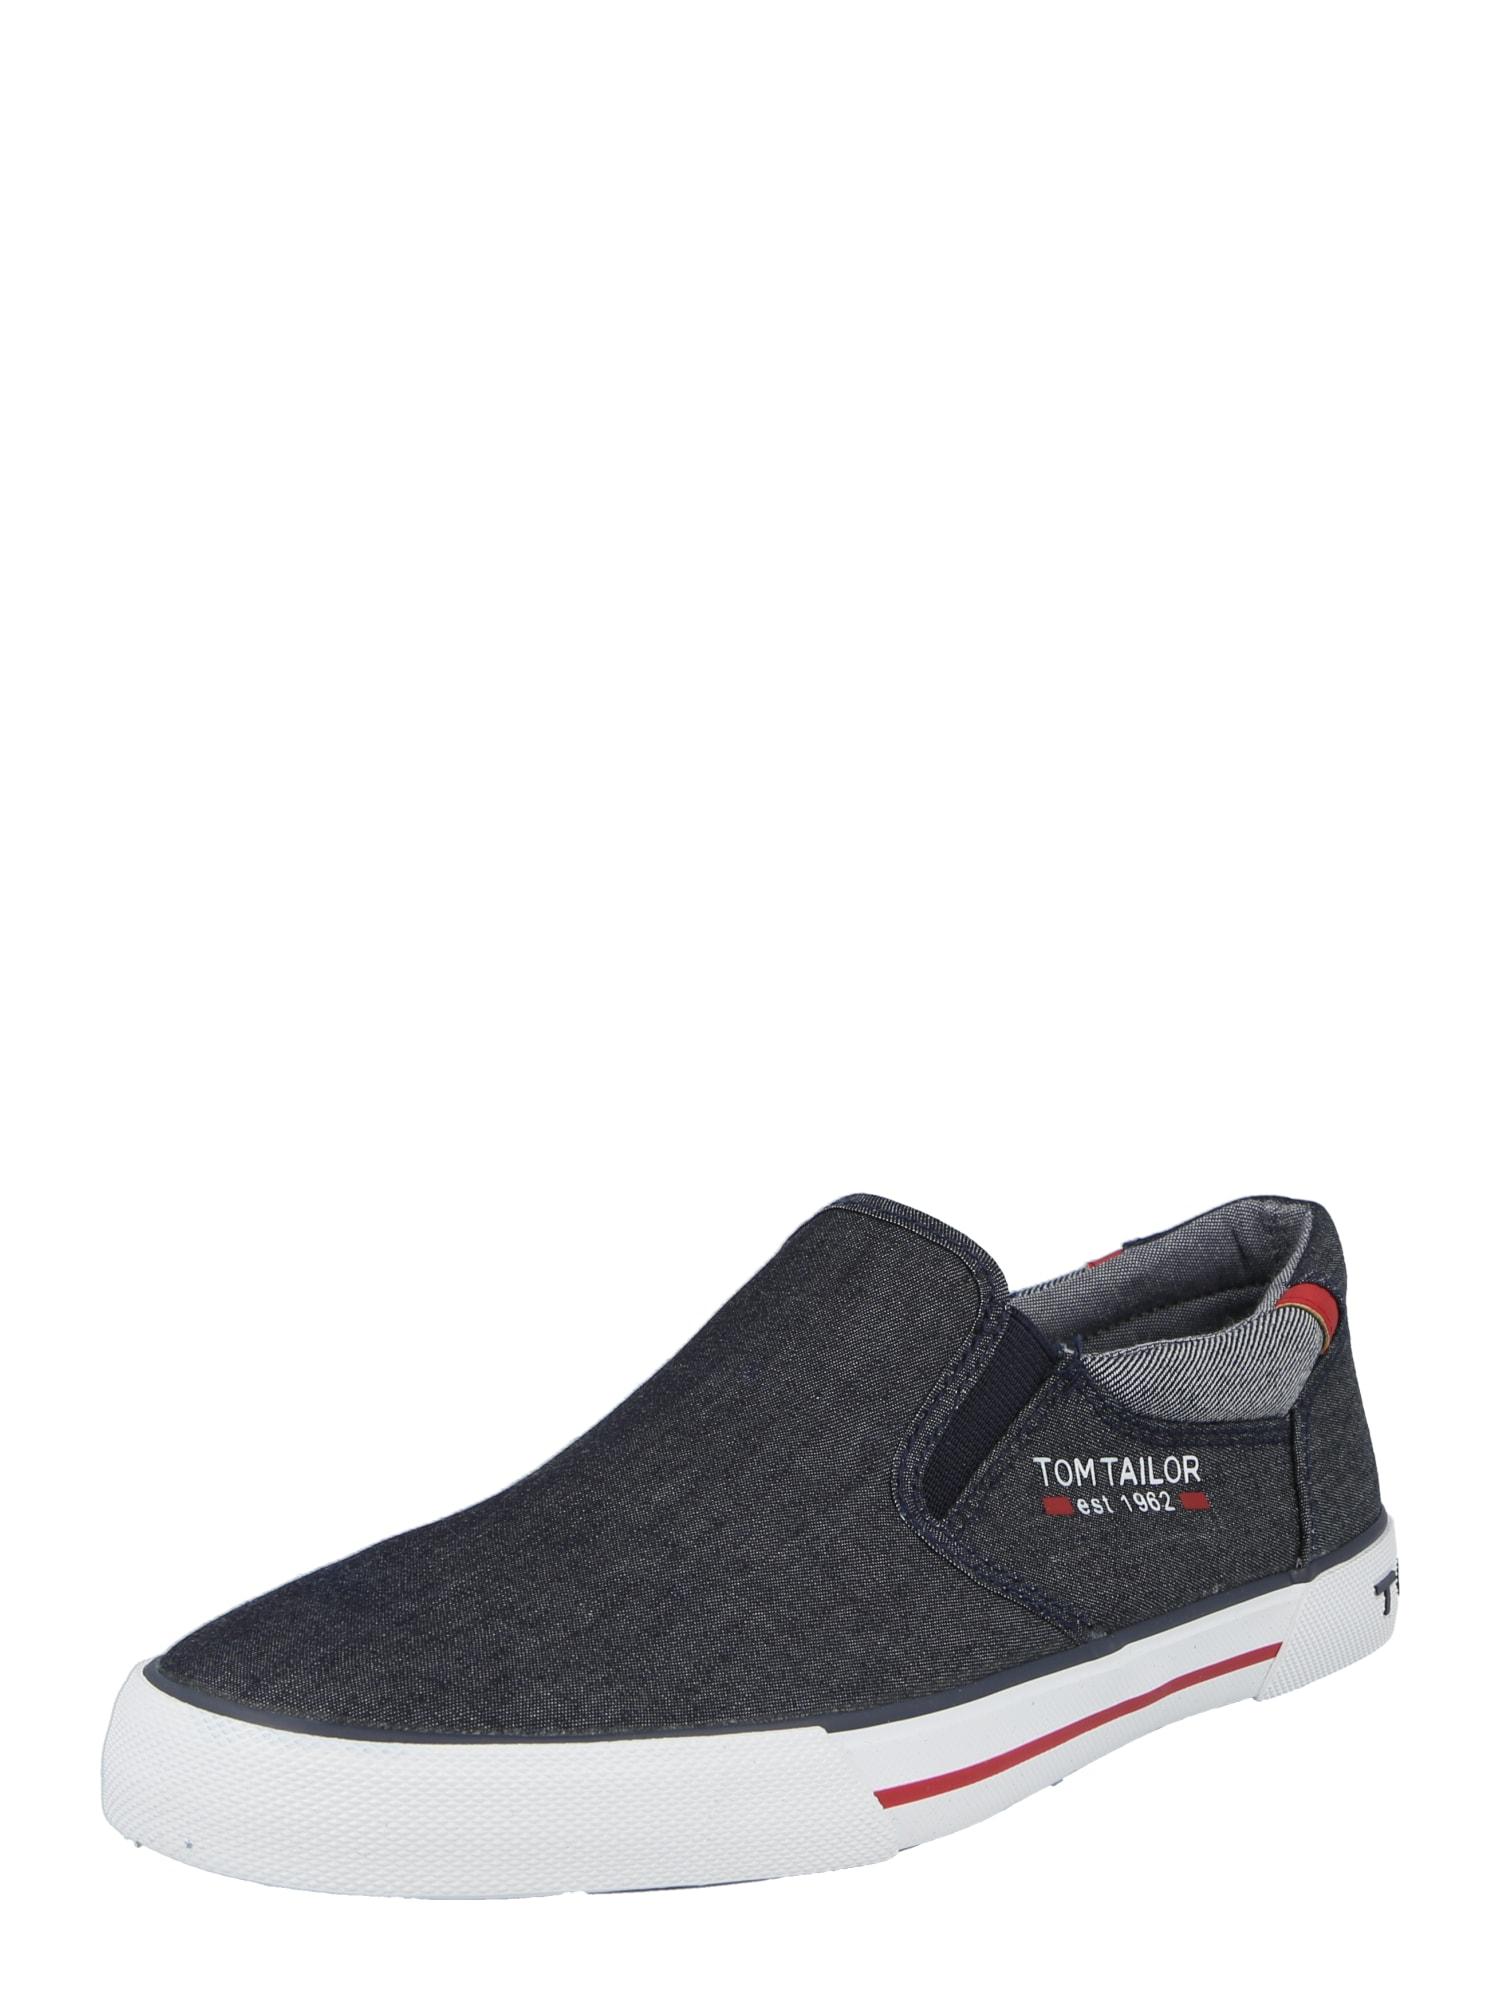 TOM TAILOR Slip on boty  tmavě modrá